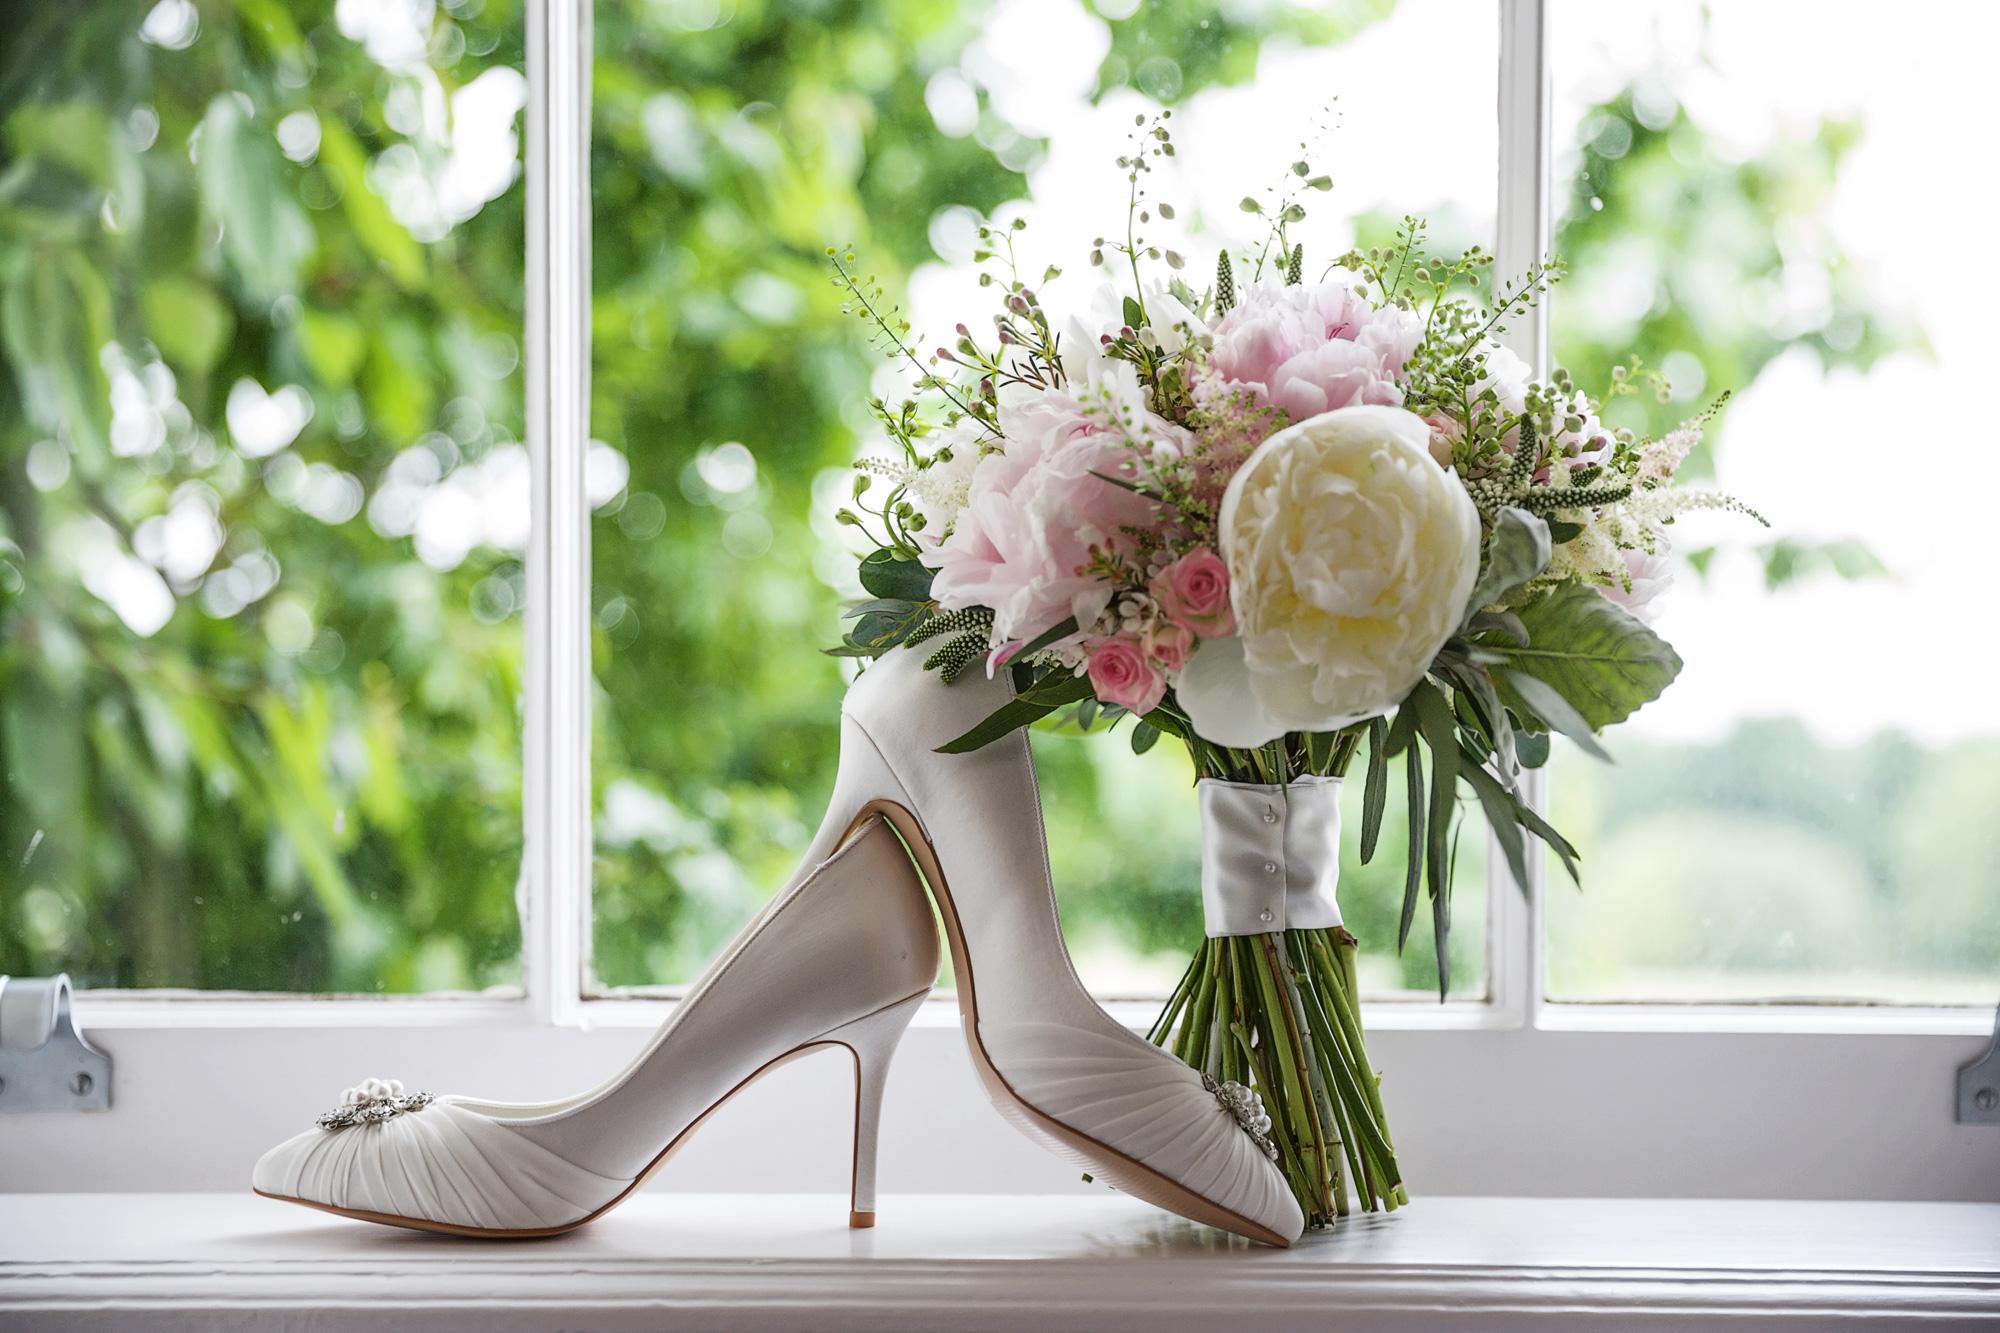 Adam_Hillier_Wedding_Photographer_Newbury_Berkshire_3 (2).jpg